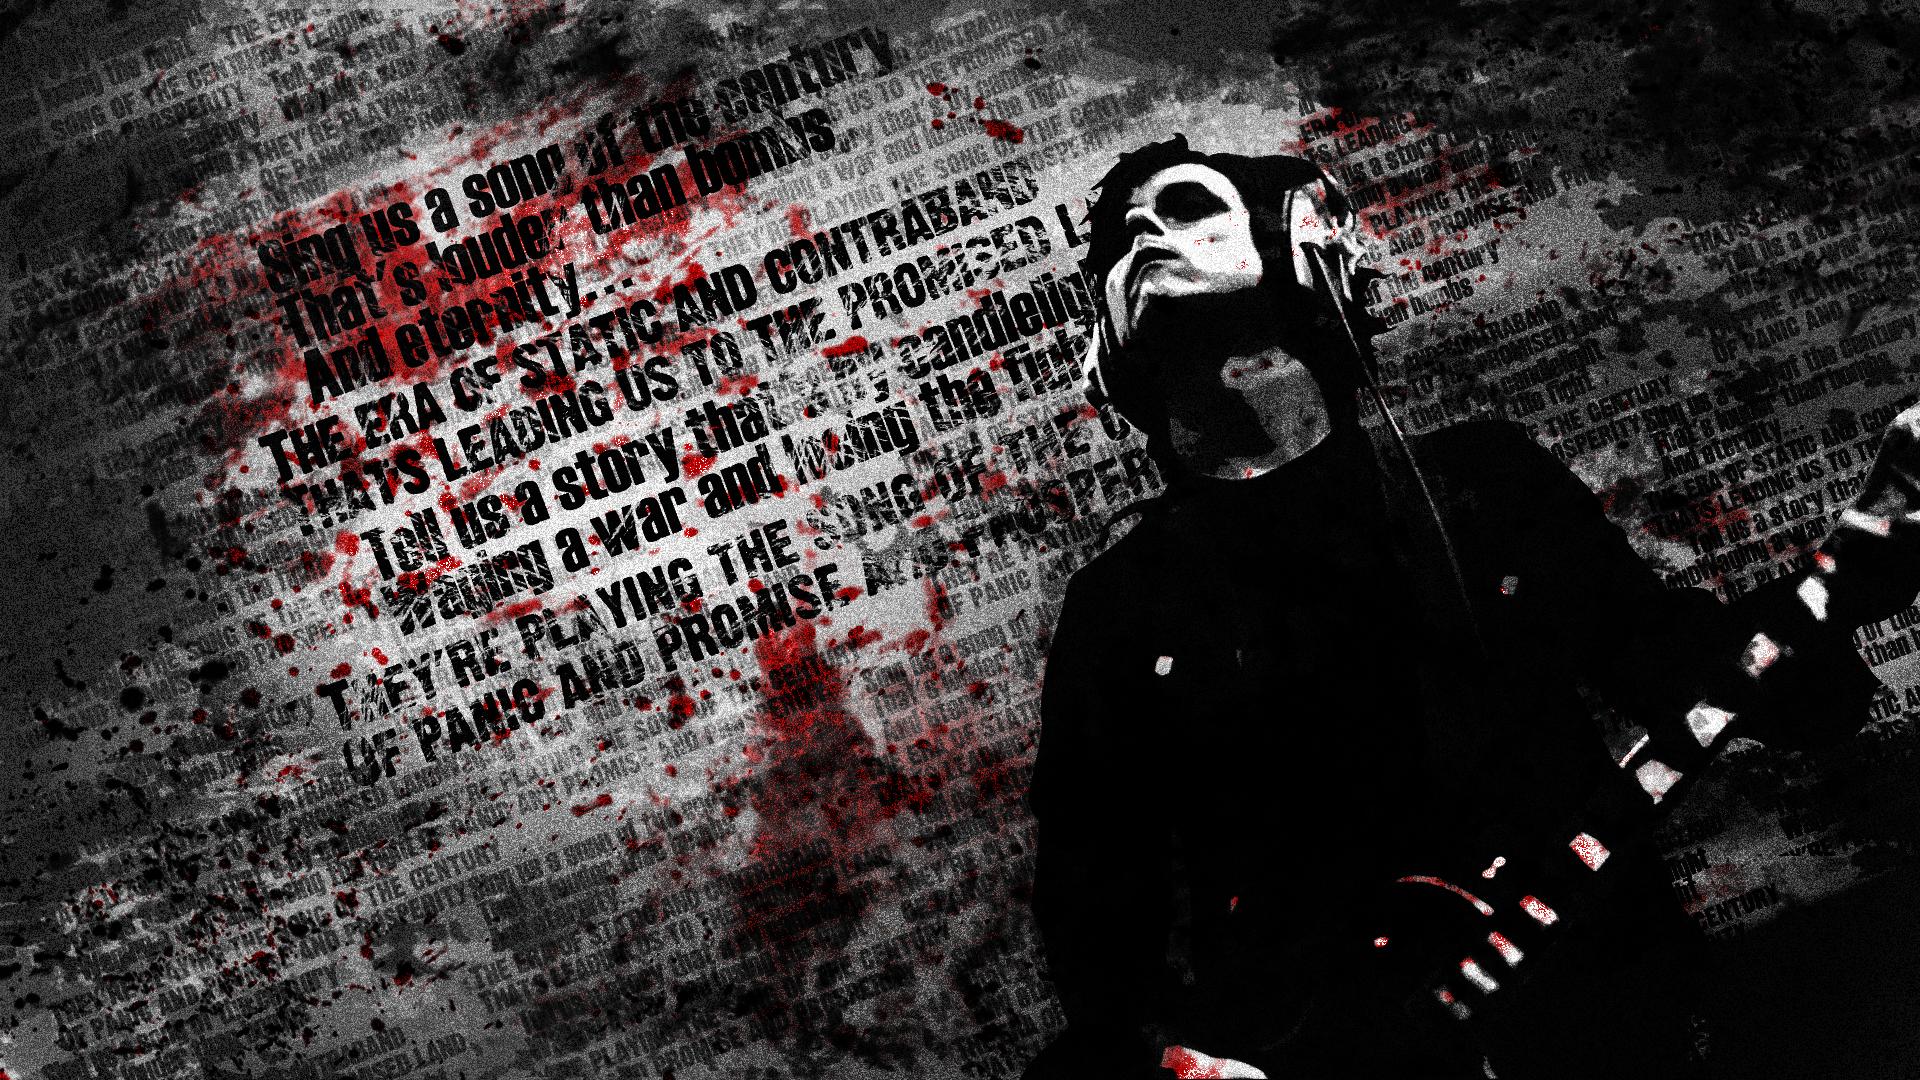 Billie Joe Lyrics   Green Day Wallpaper 1920x1080